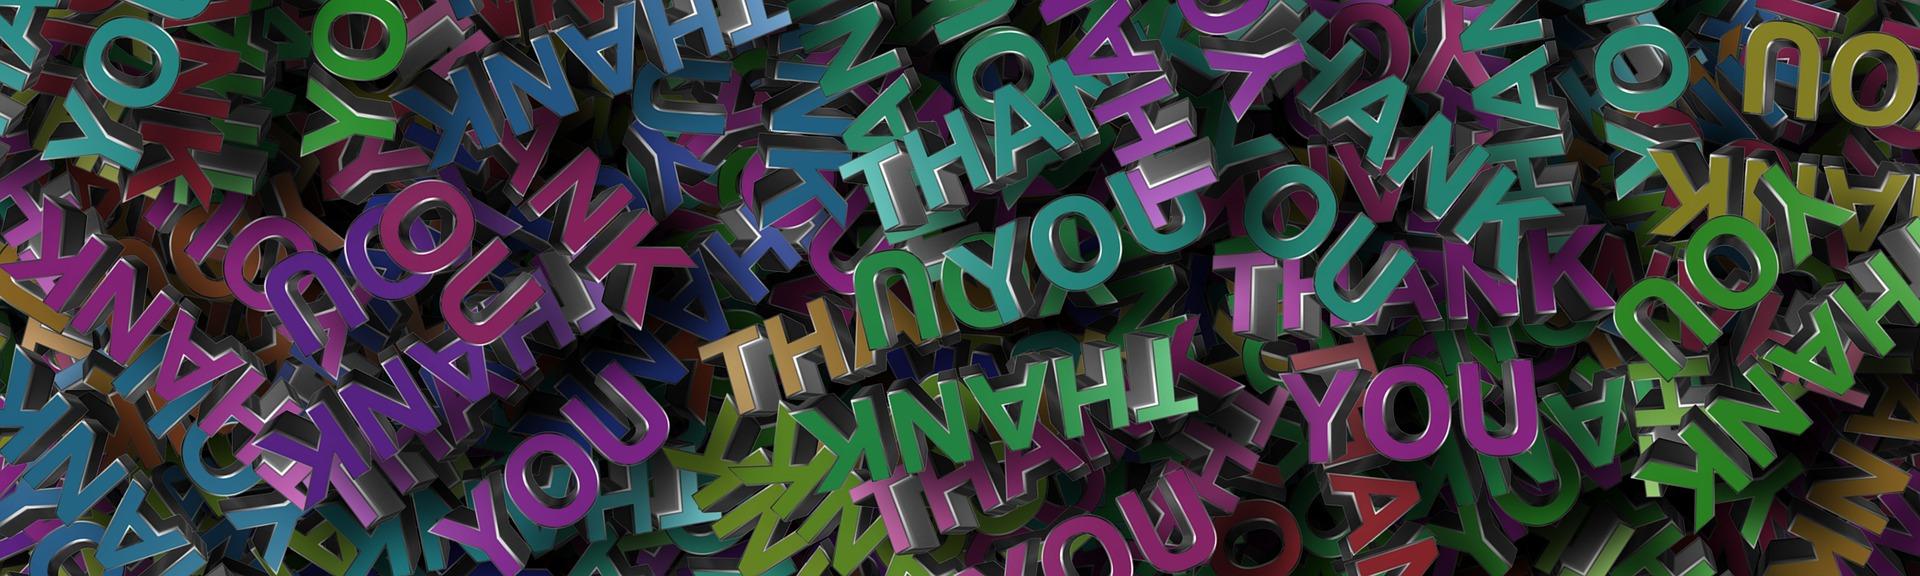 The Transformative Power Of Gratitude